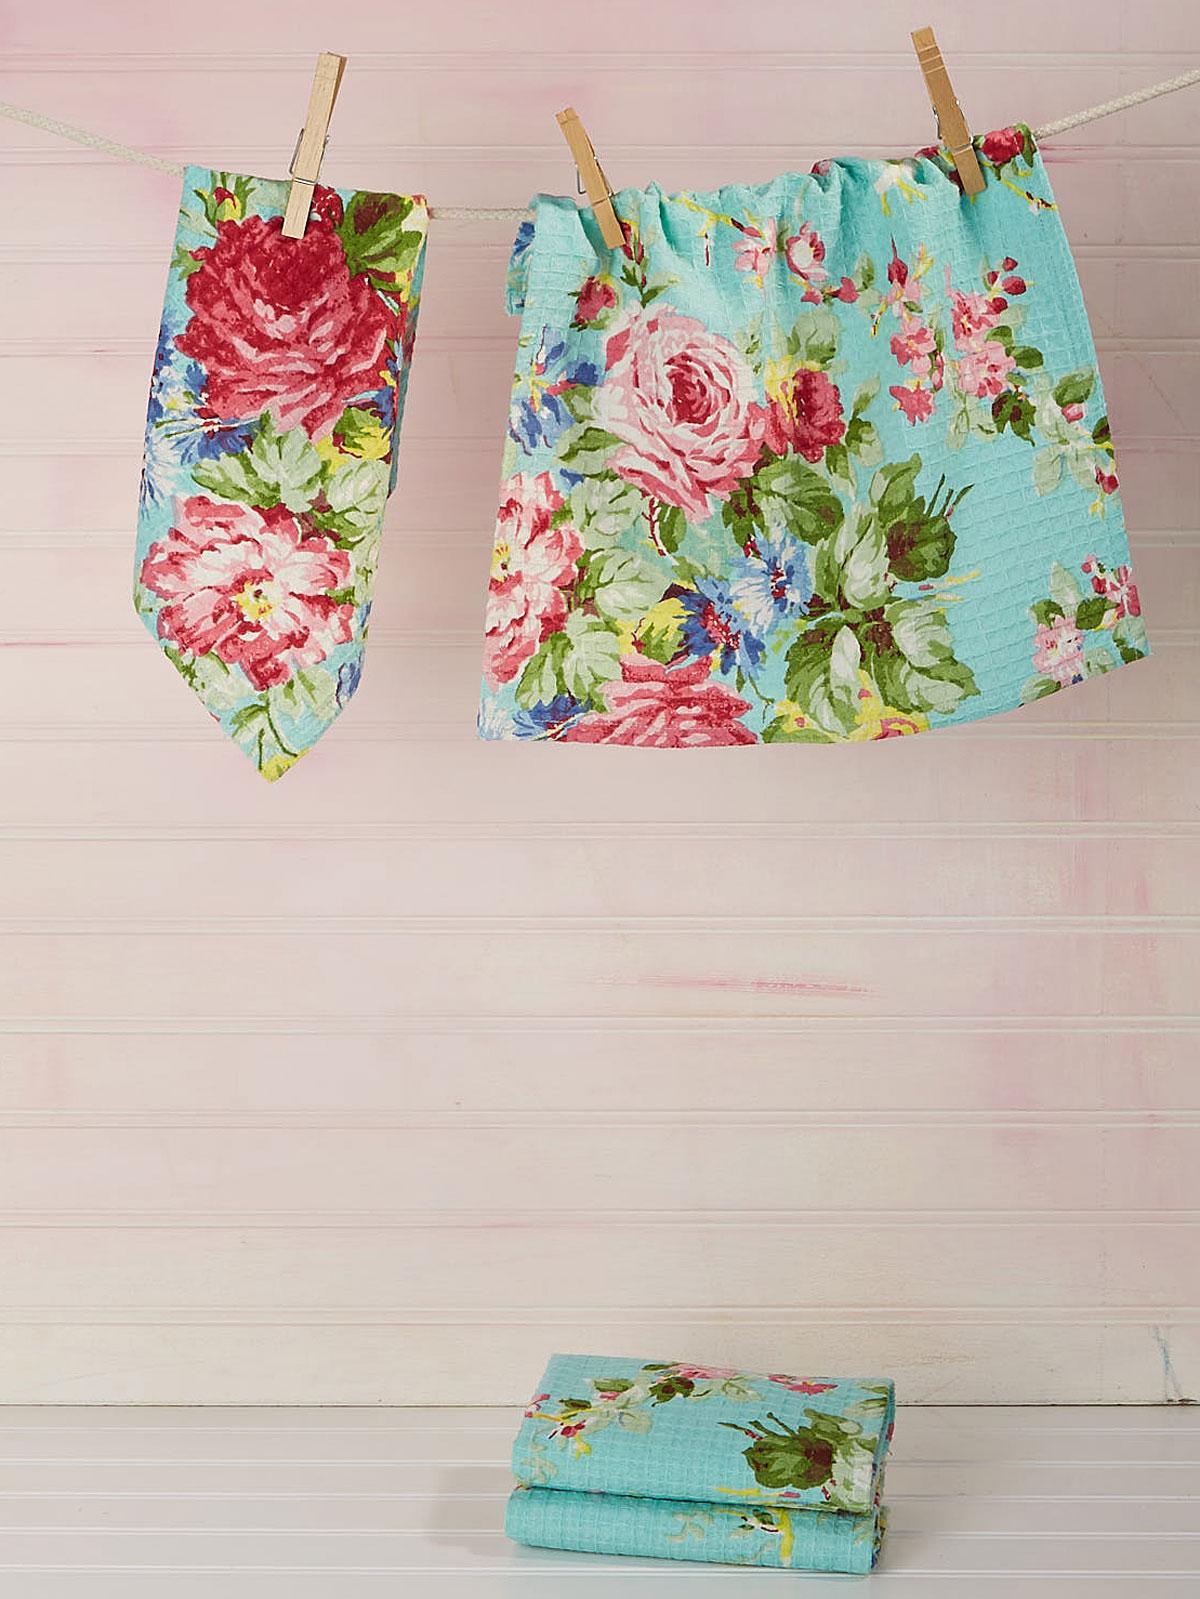 Cottage Rose Tiny Towel Set of 4